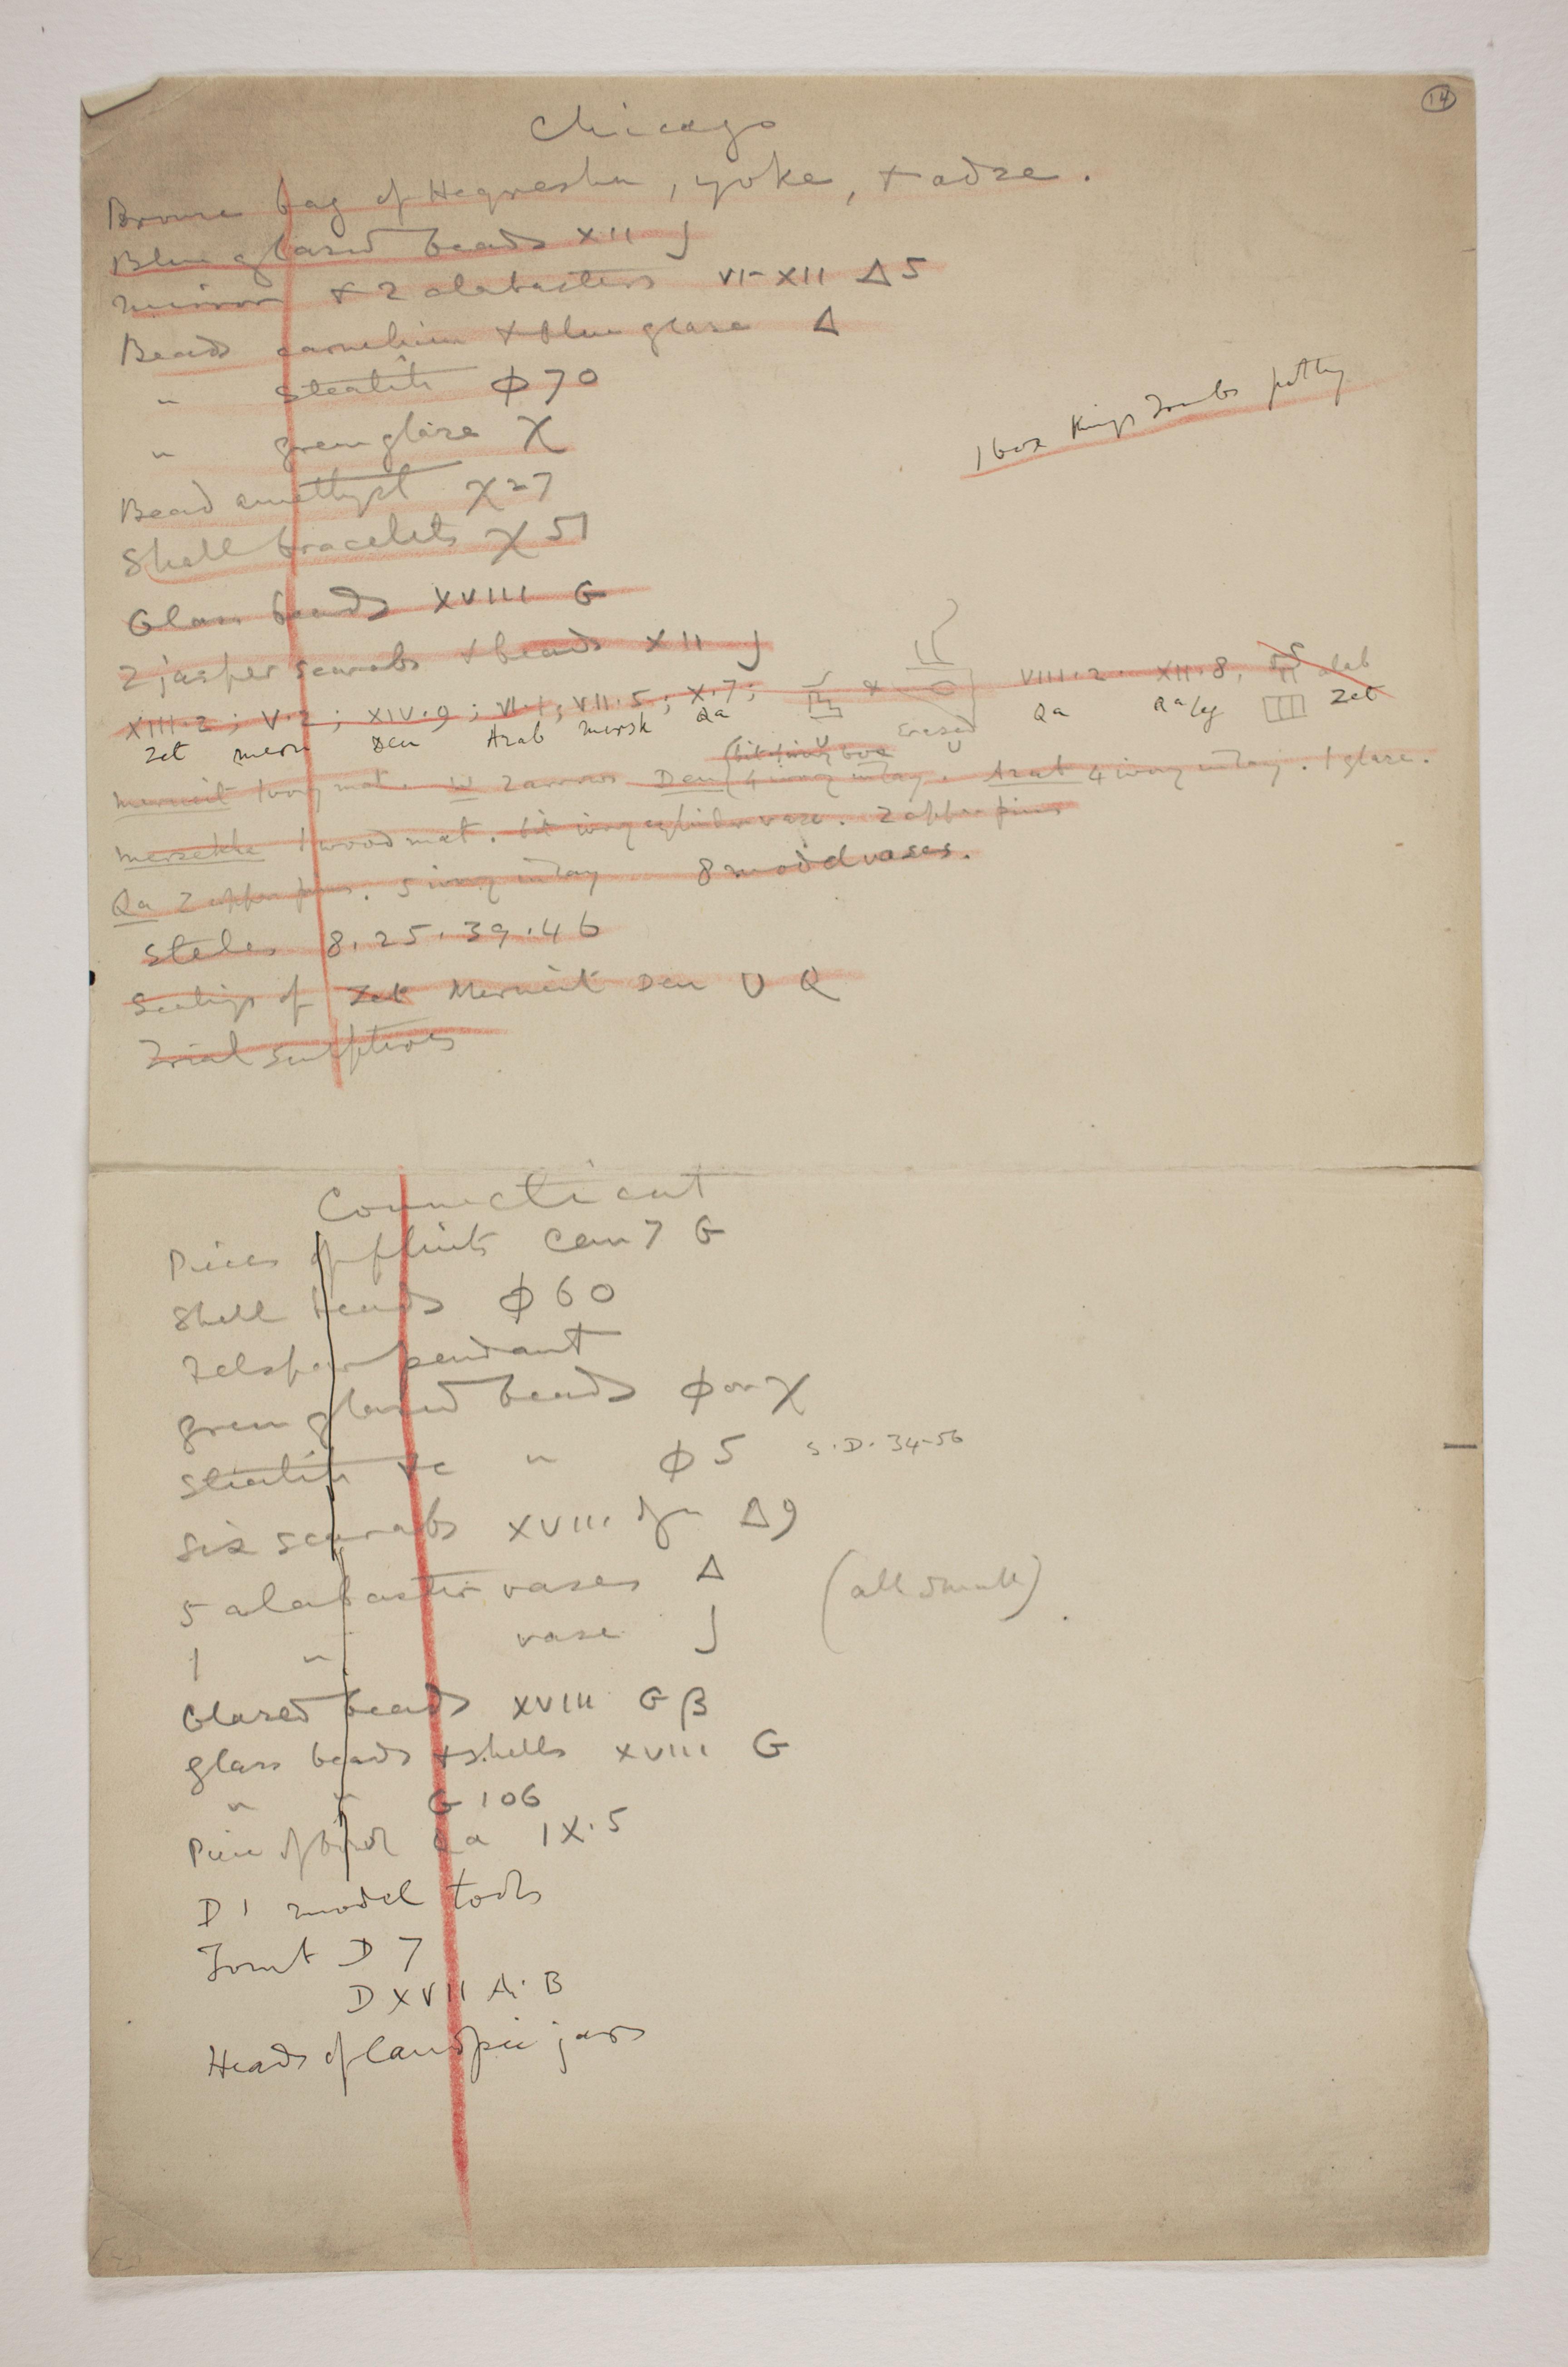 1899-1900 Abydos Multiple institution list PMA/WFP1/D/8/13.1